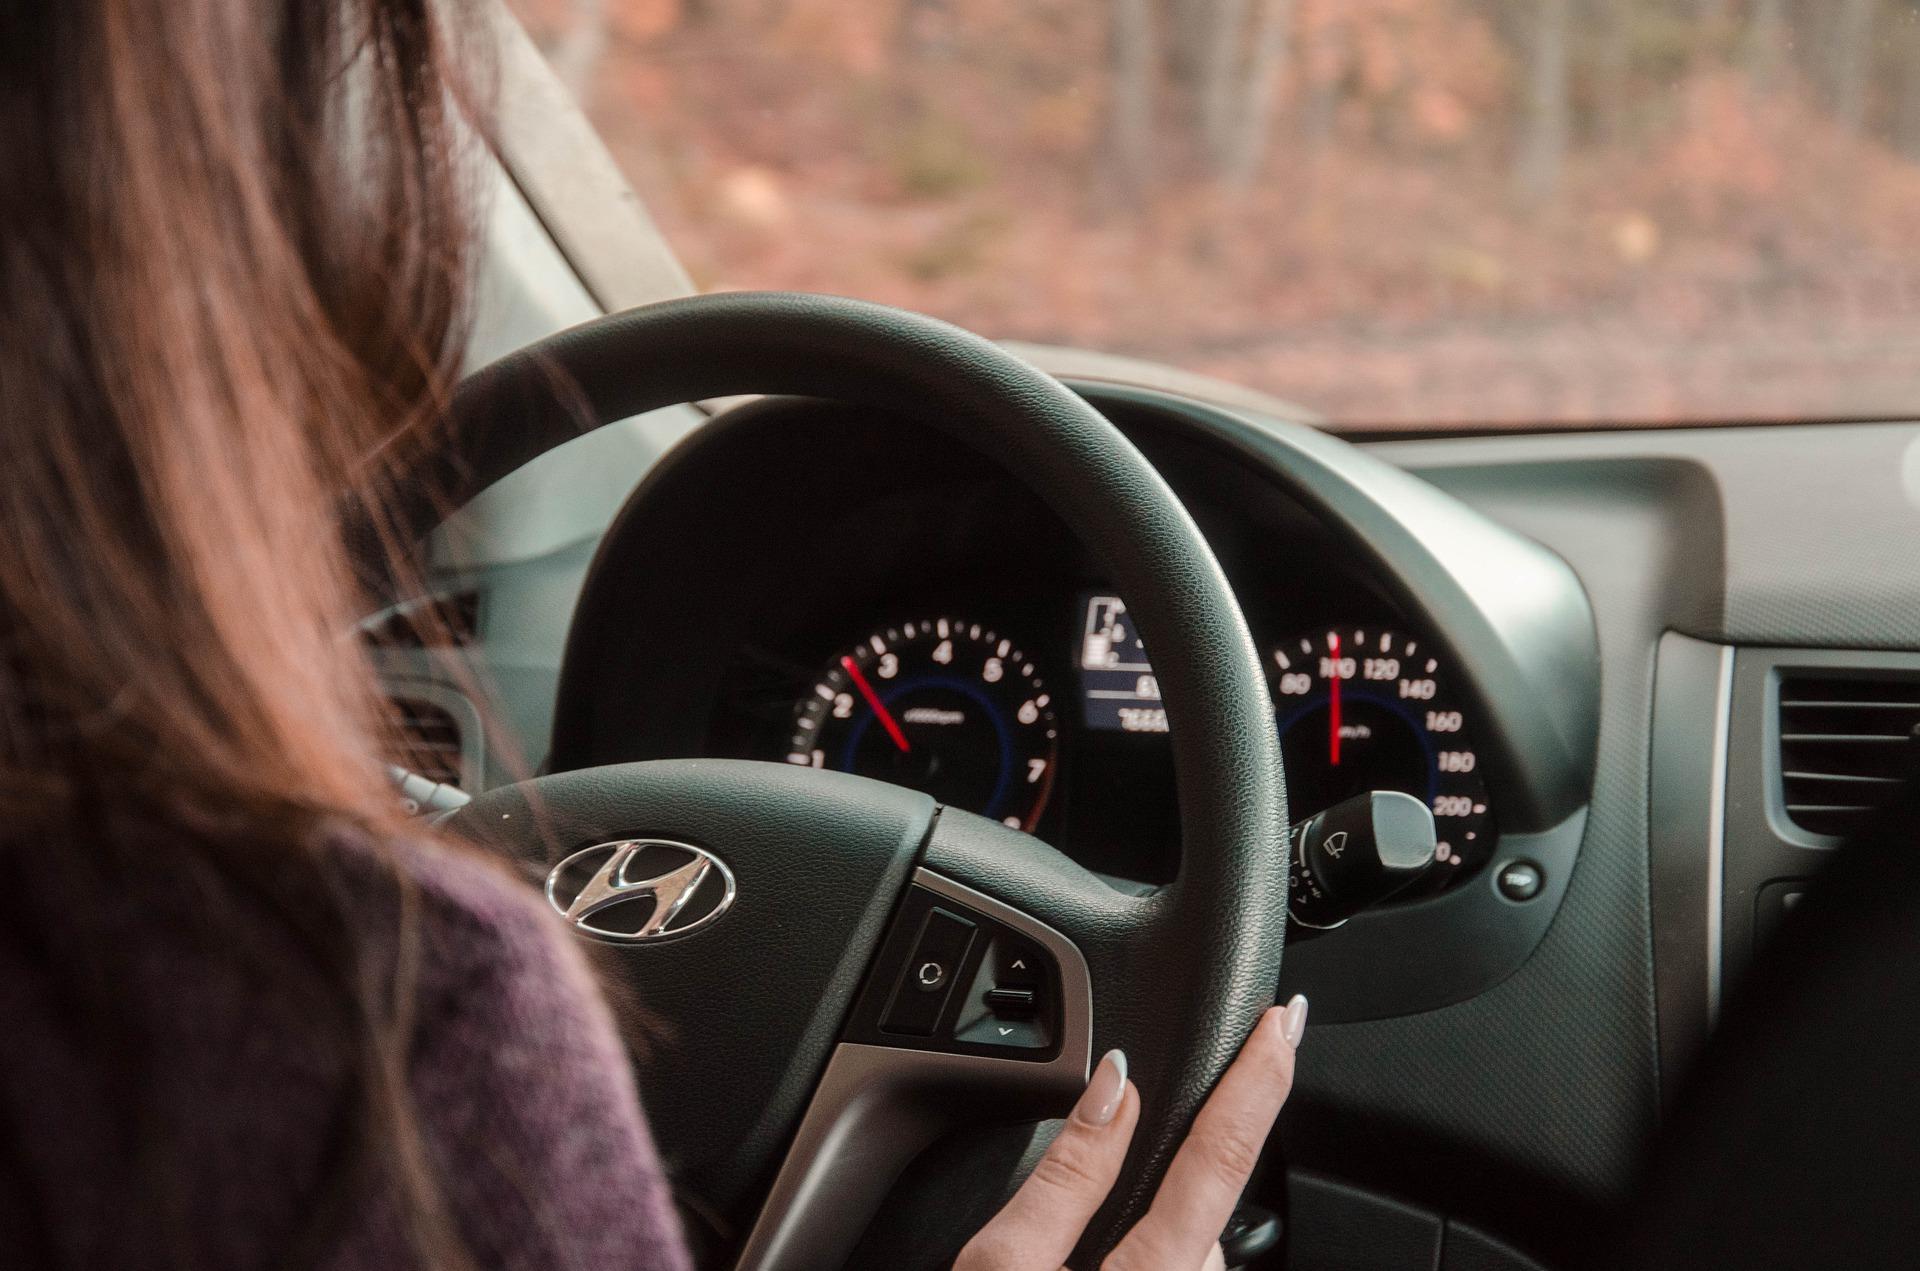 behind-the-wheel-4789777_1920